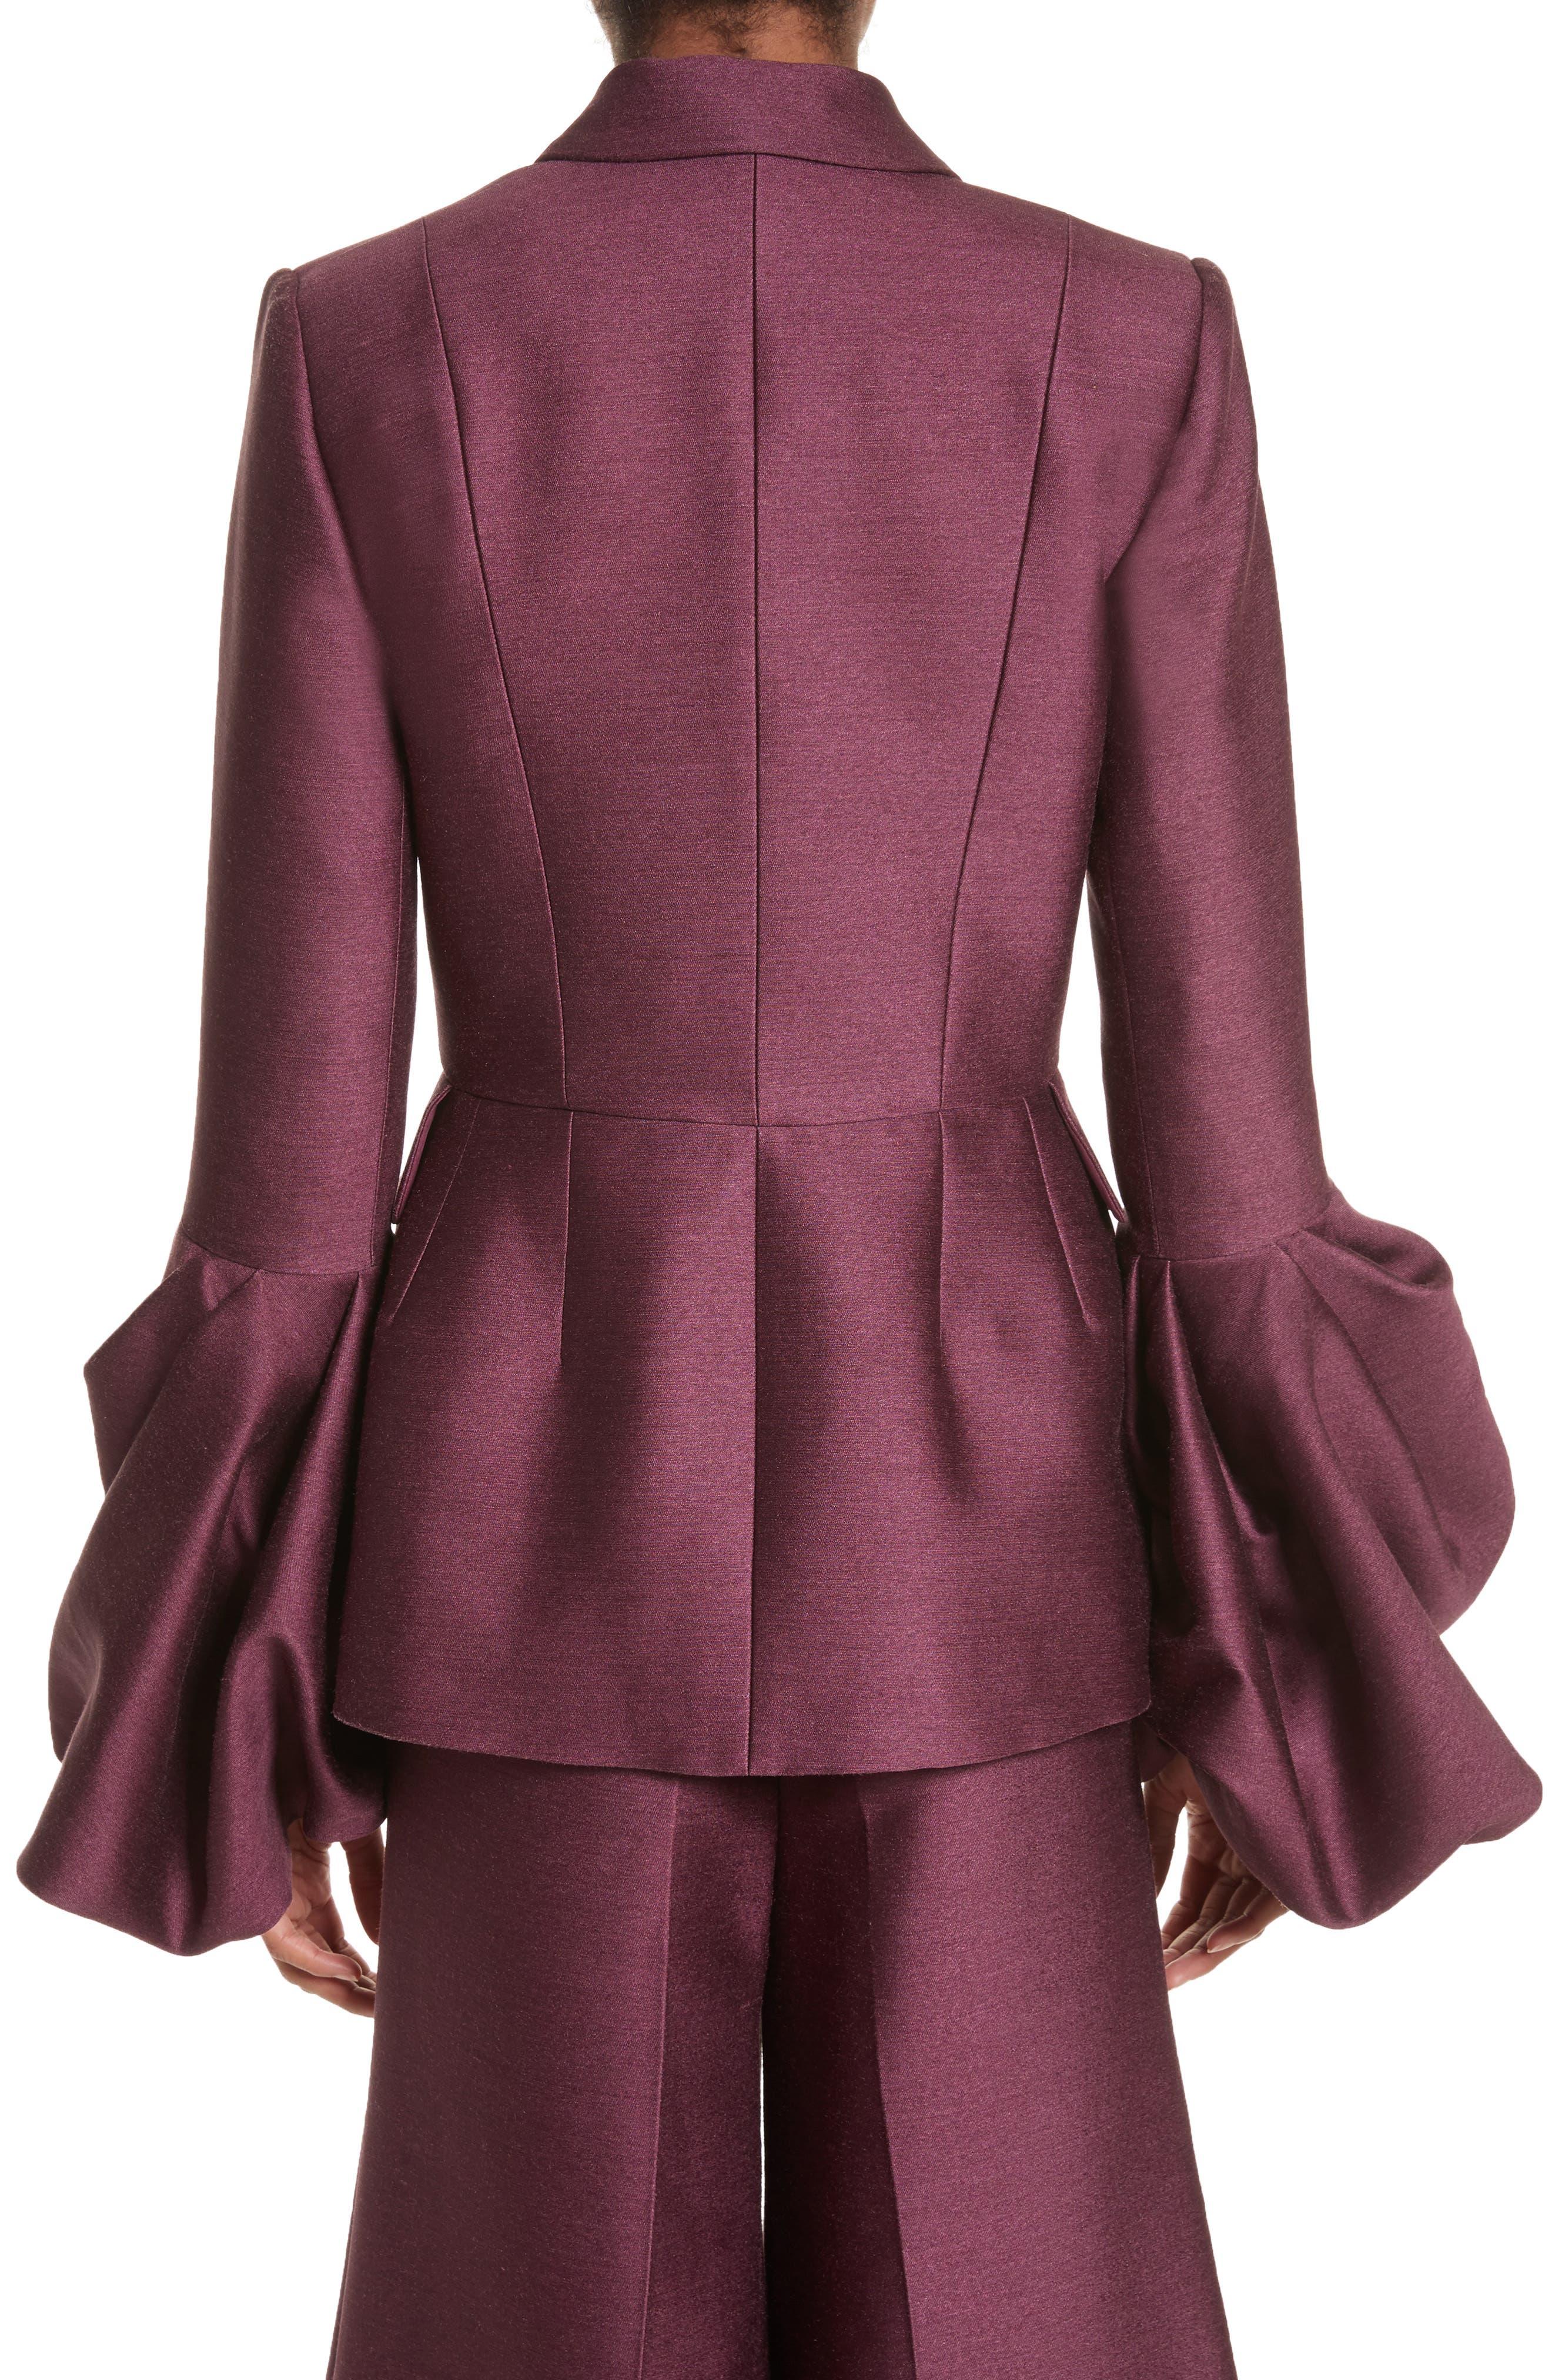 Narika Wool & Silk Jacket,                             Alternate thumbnail 2, color,                             Plum